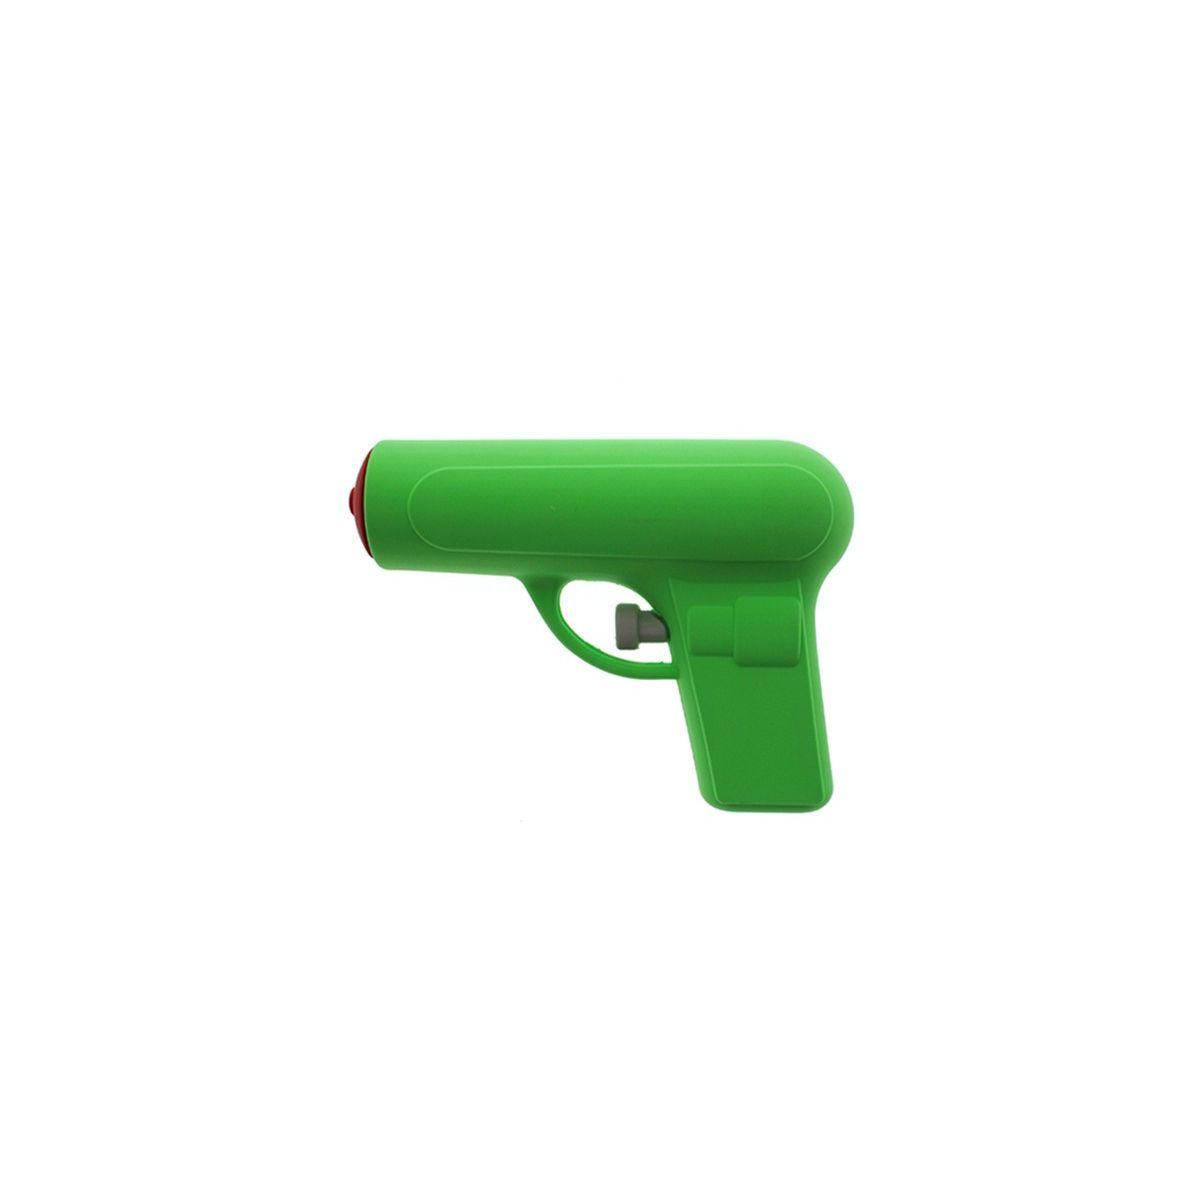 Batterie externe mojipower powerbank 2600 mah emoji gun - 2% de remise imm�diate avec le code : deal2 (photo)